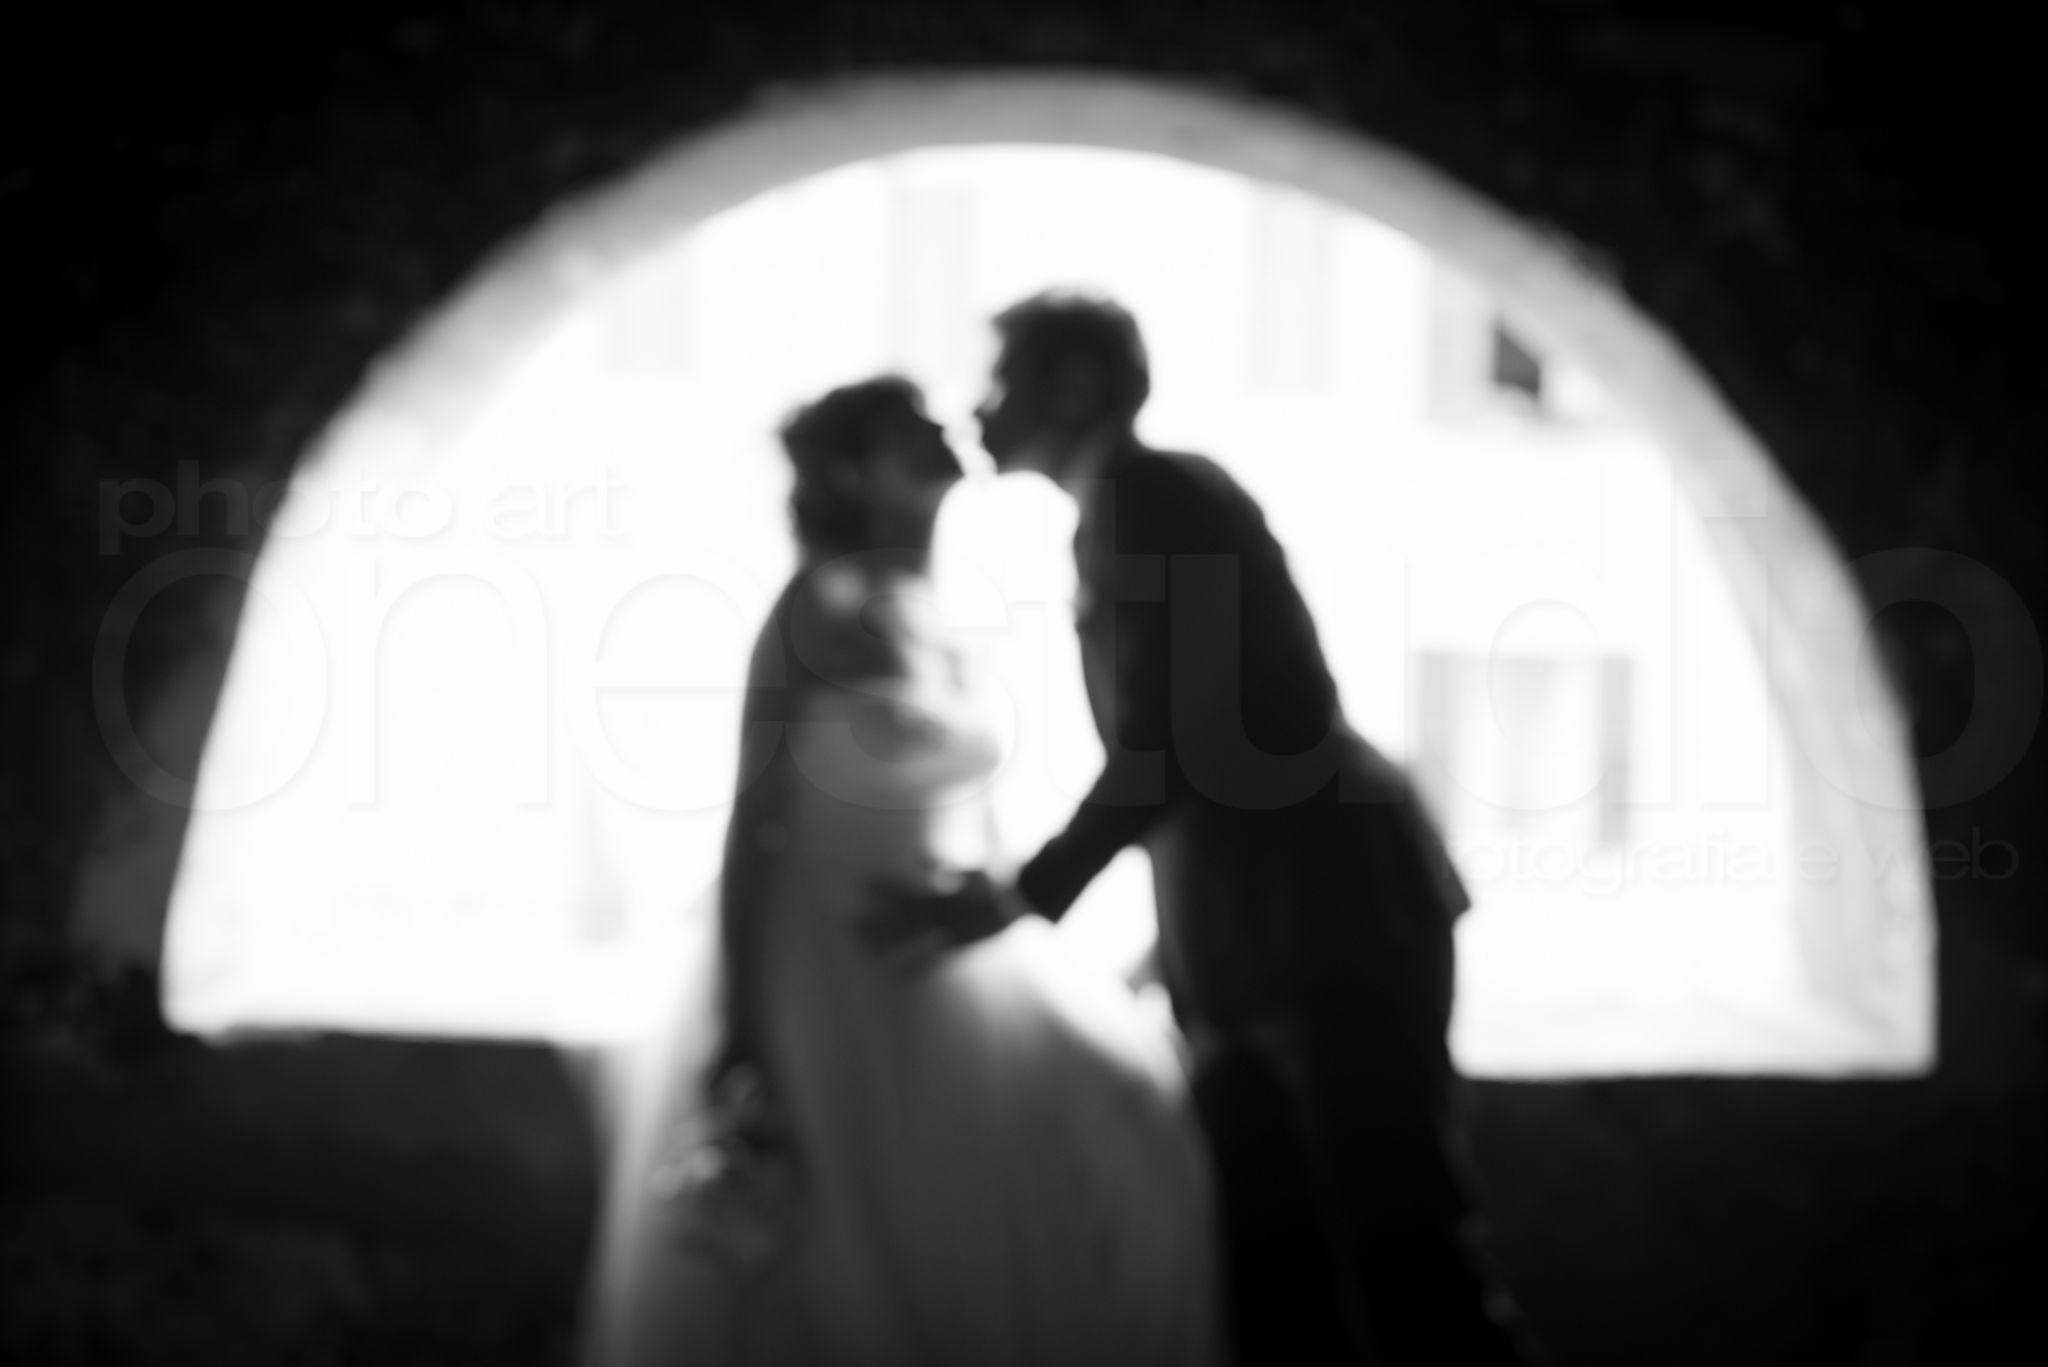 https://lnx.mirkone.it/wp-content/uploads/2015/07/fotografo-matrimoni-faenza-0022.jpg